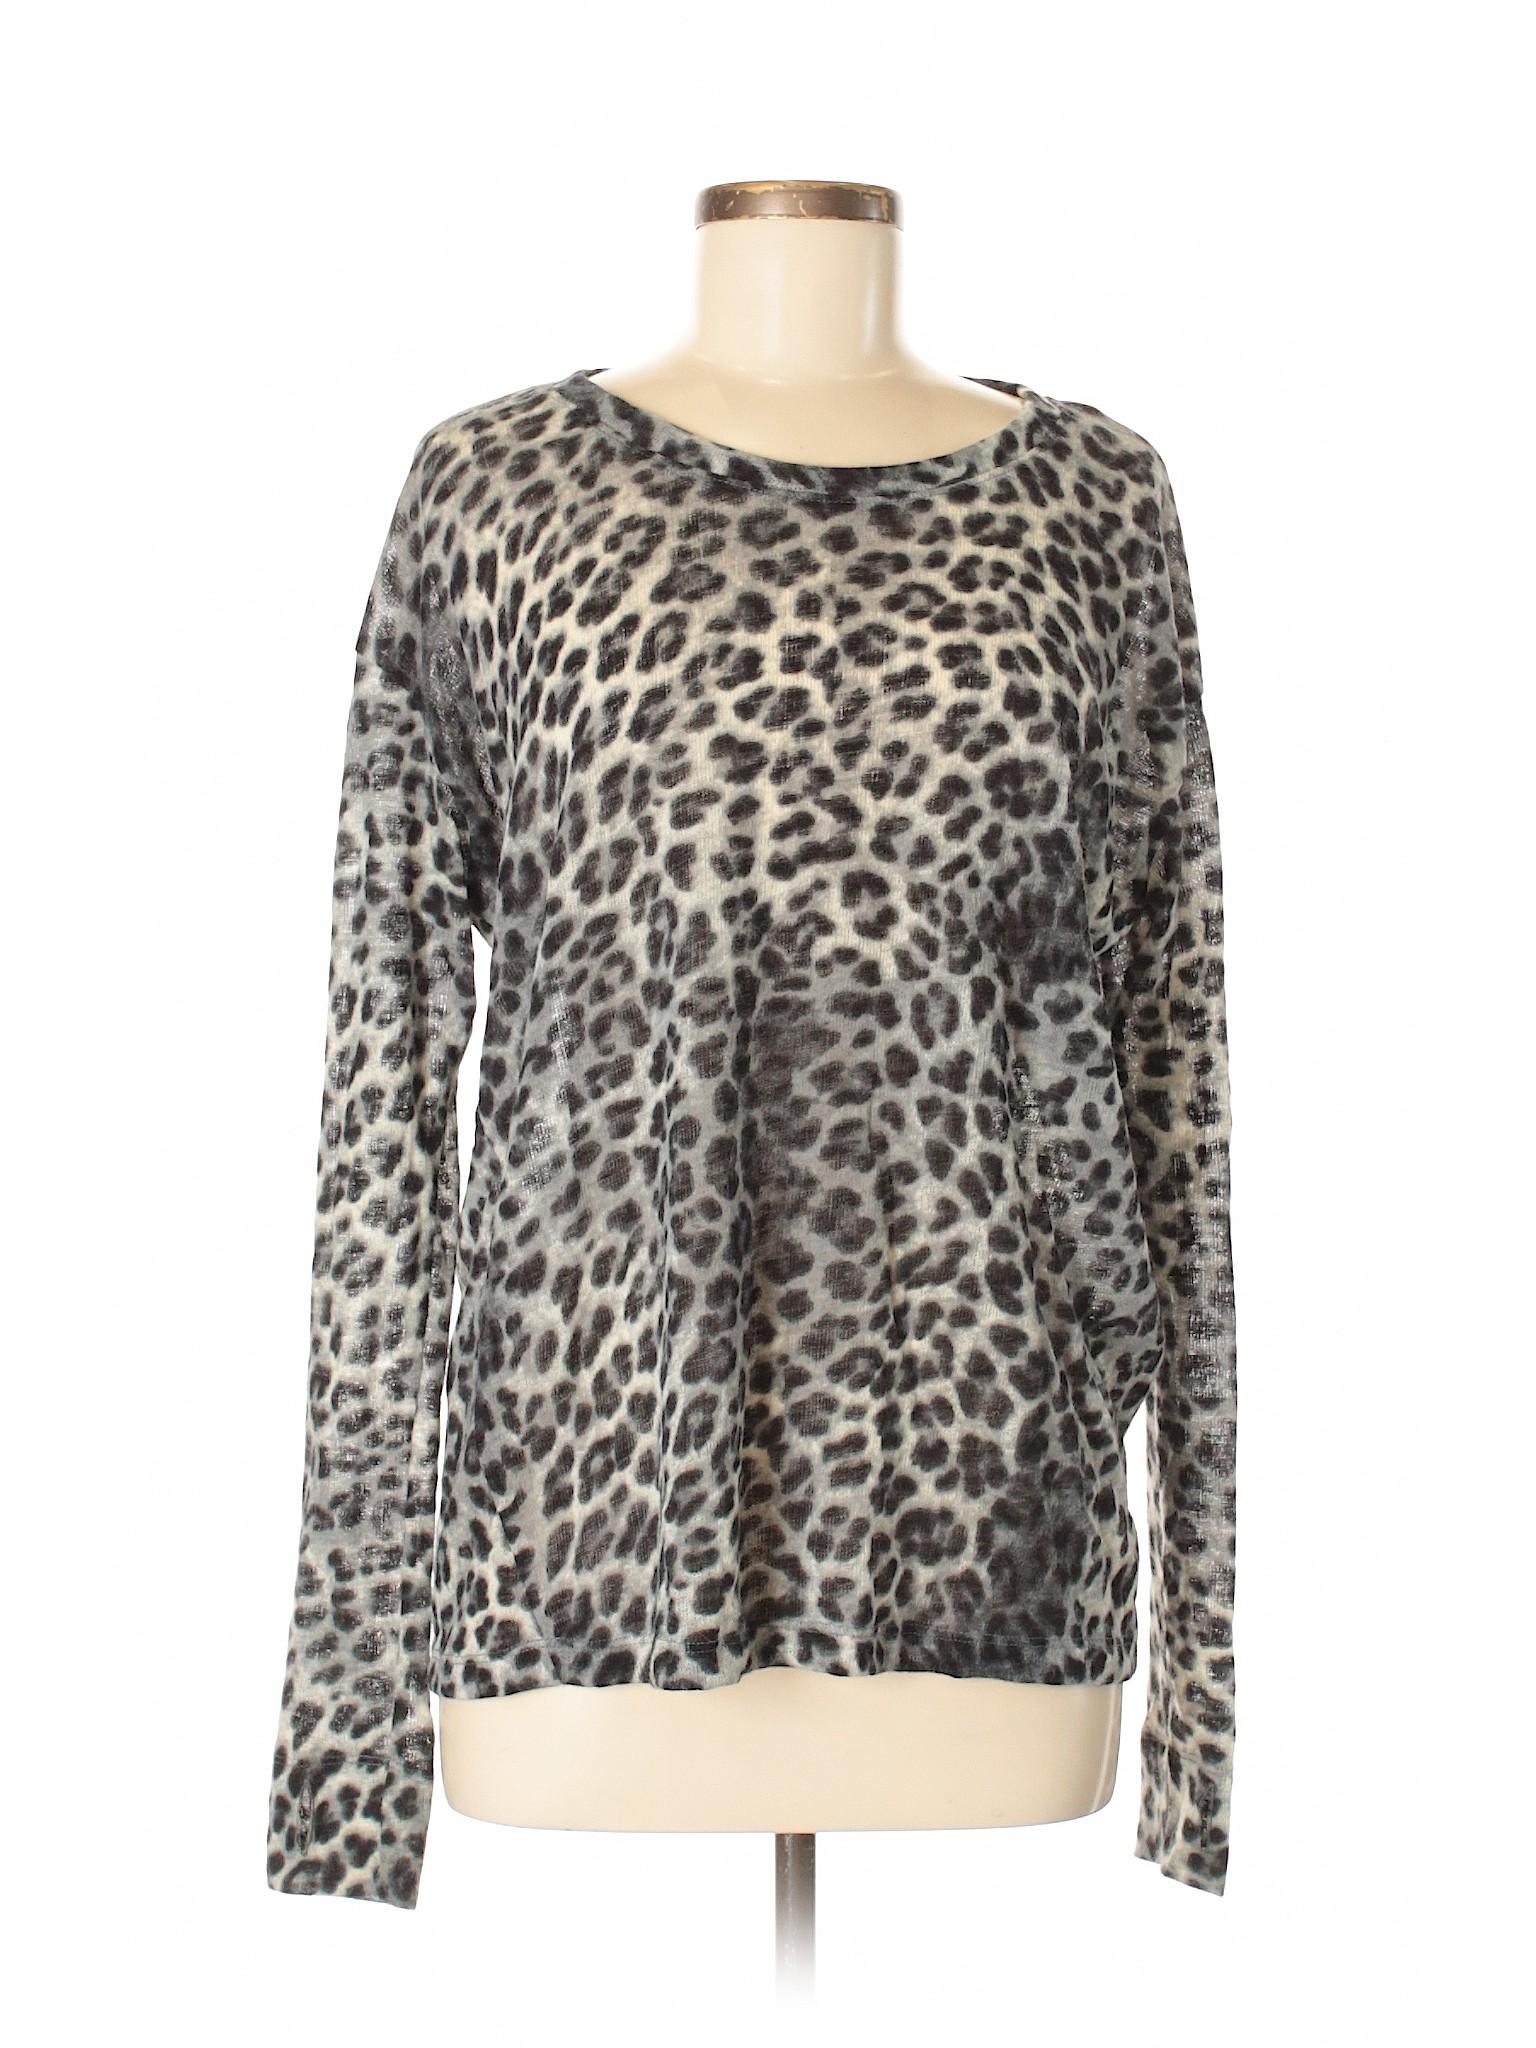 Boutique John John Eshaya Pullover Sweater Boutique Eshaya PqZSx